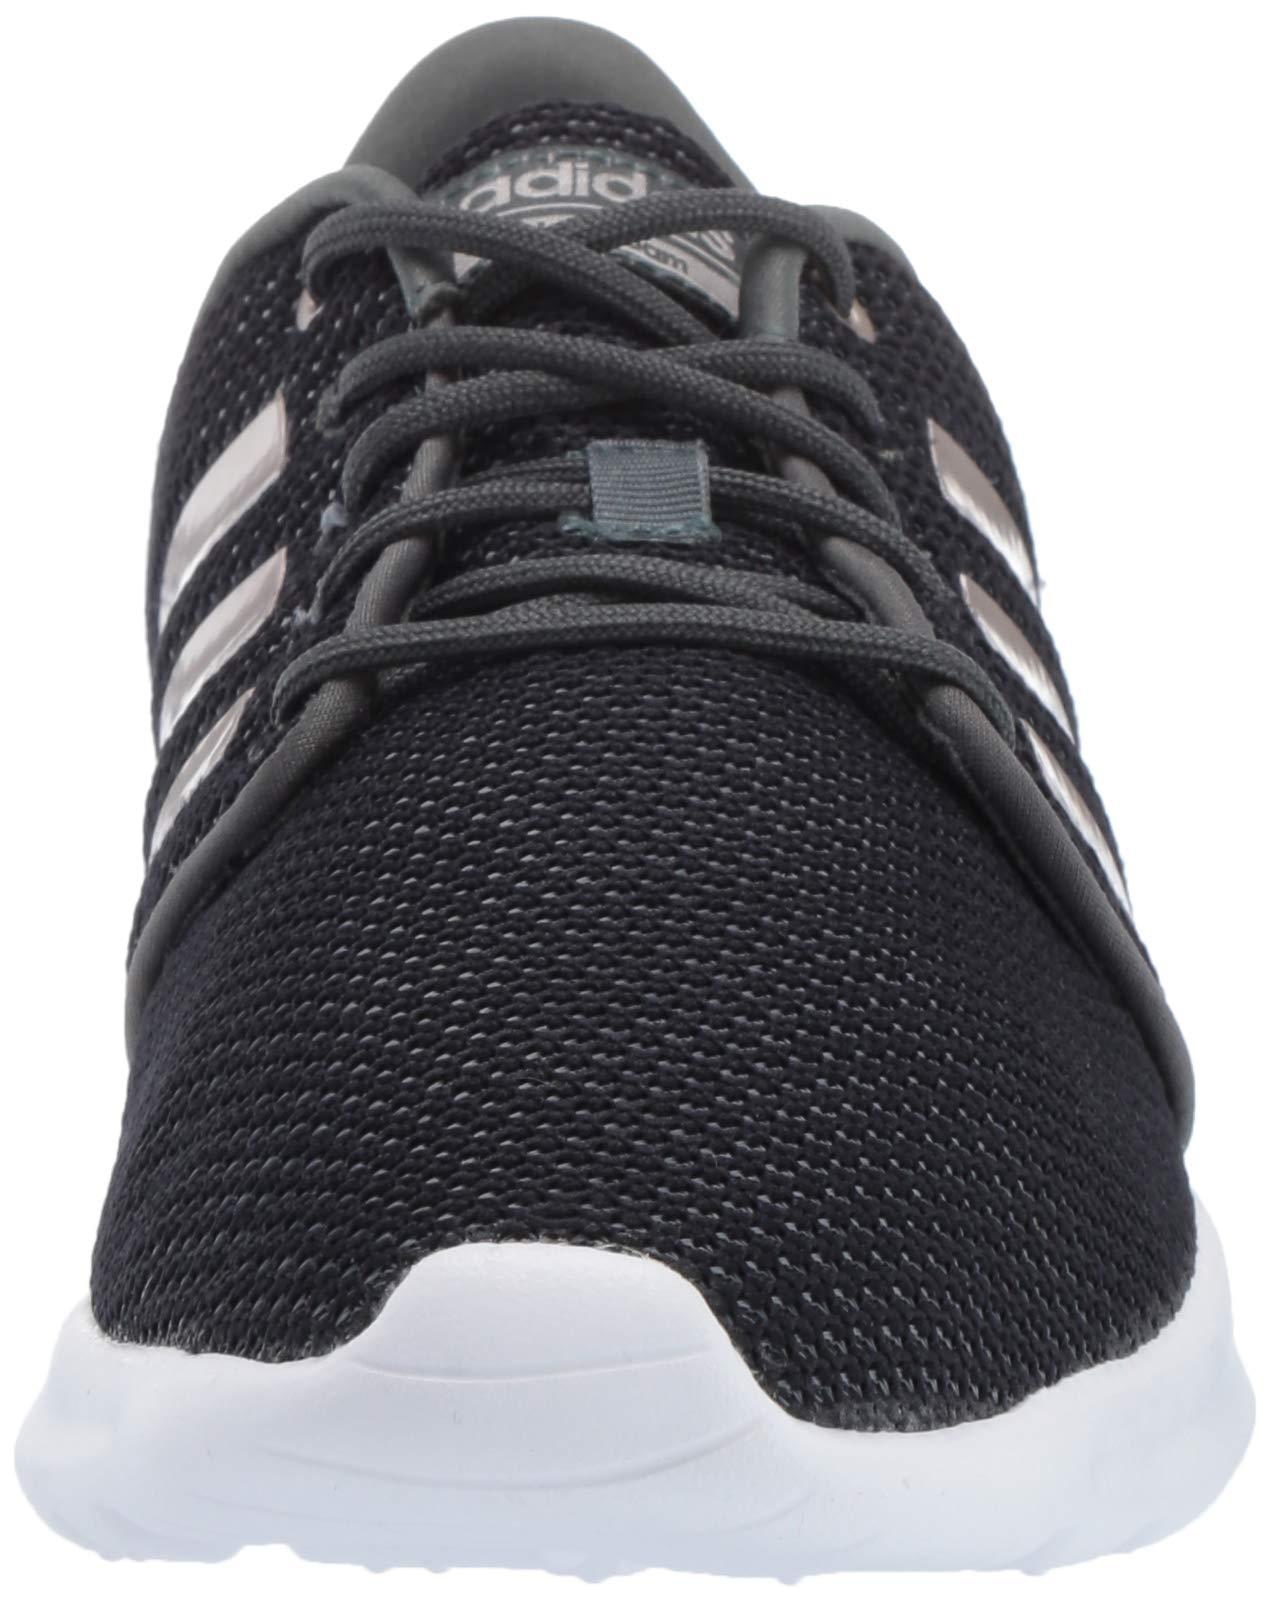 adidas Women's Cloudfoam QT Racer, Legend Ivy/Platino Metallic/Black, 5.5 M US by adidas (Image #4)